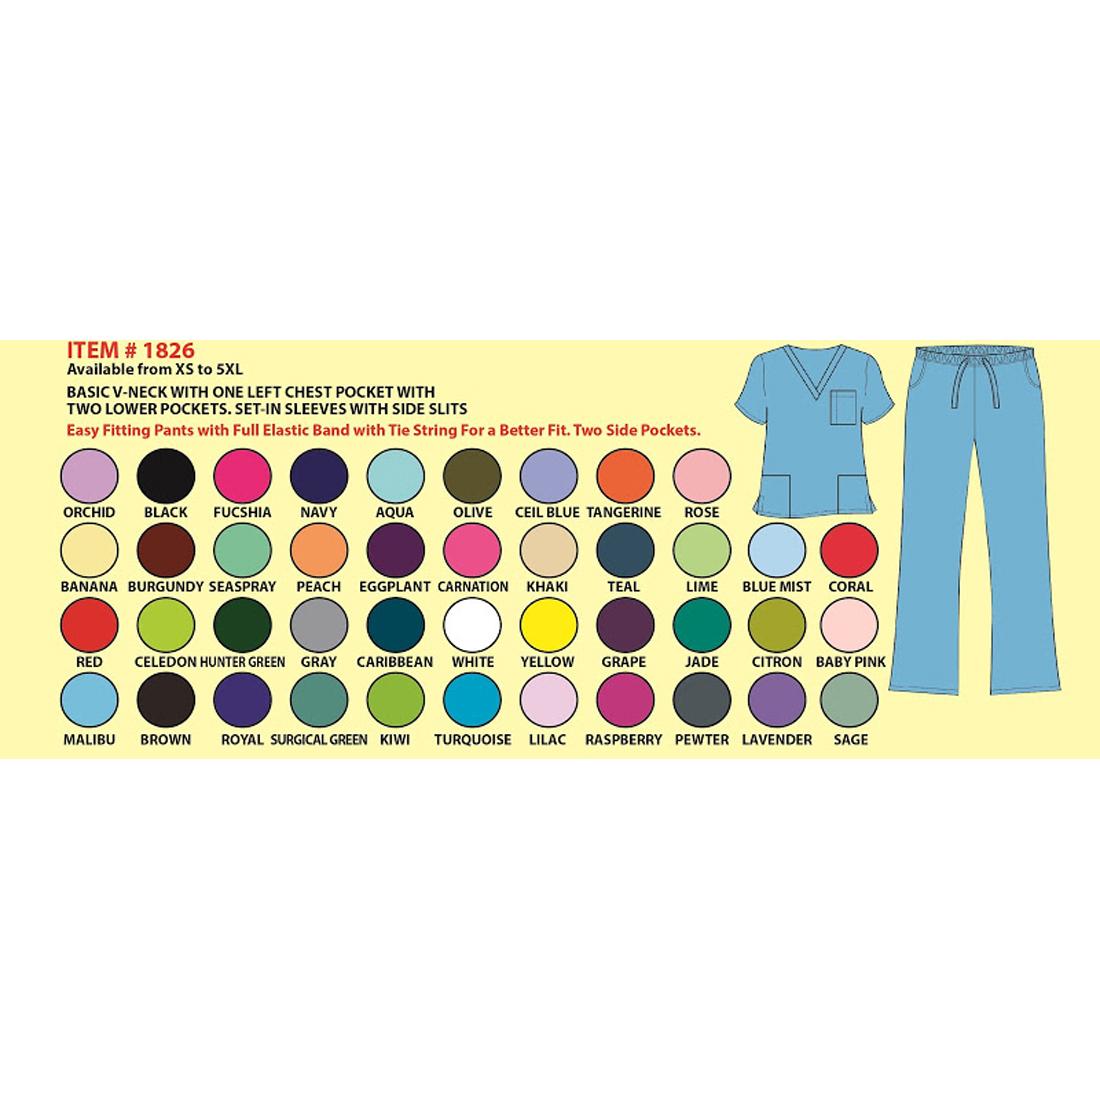 4bfb1fda00a Unisex V-Neck Scrub Set DSF Medical Uniform Women Men Top and Pants ...